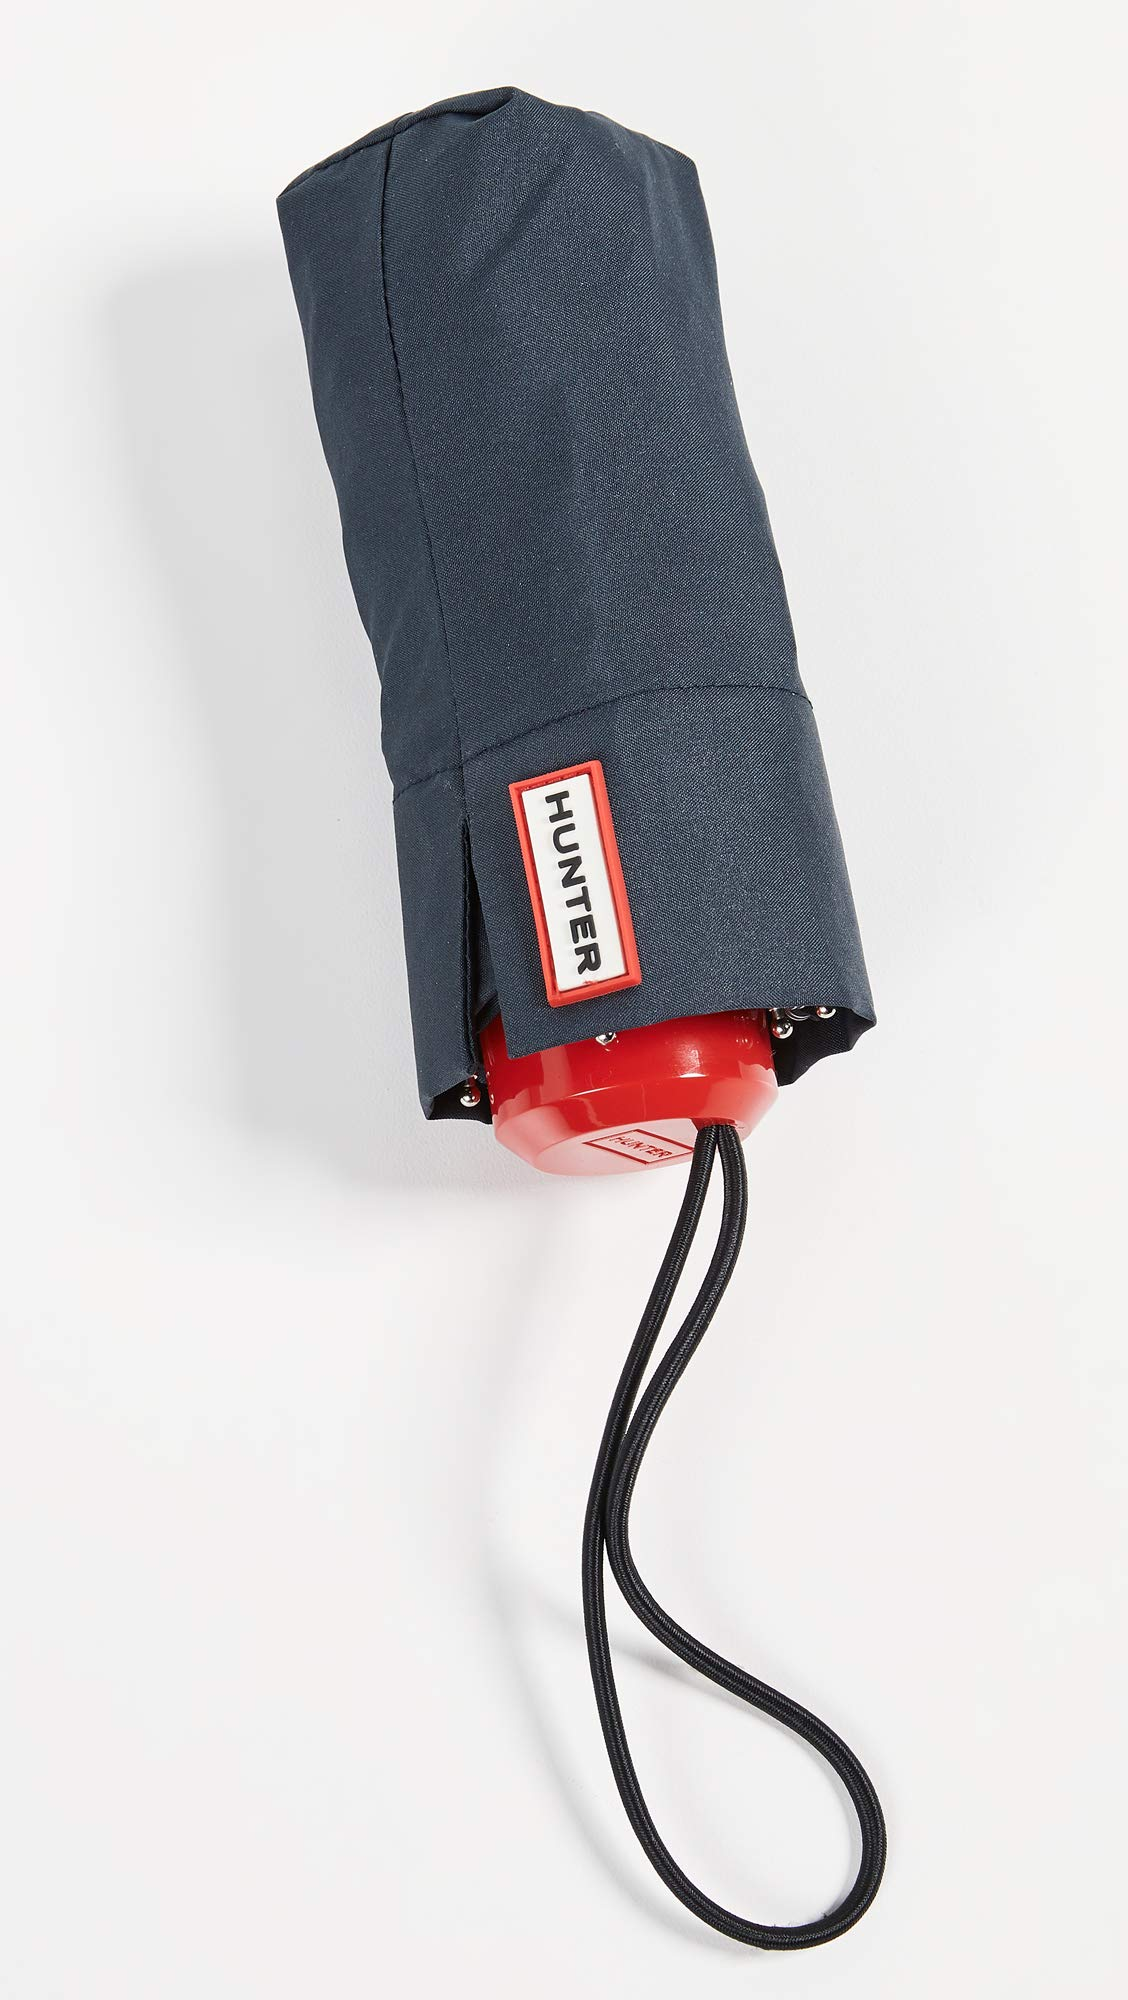 Hunter Boots Men's Original Mini Compact Umbrella, Navy, Blue, One Size by Hunters (Image #3)